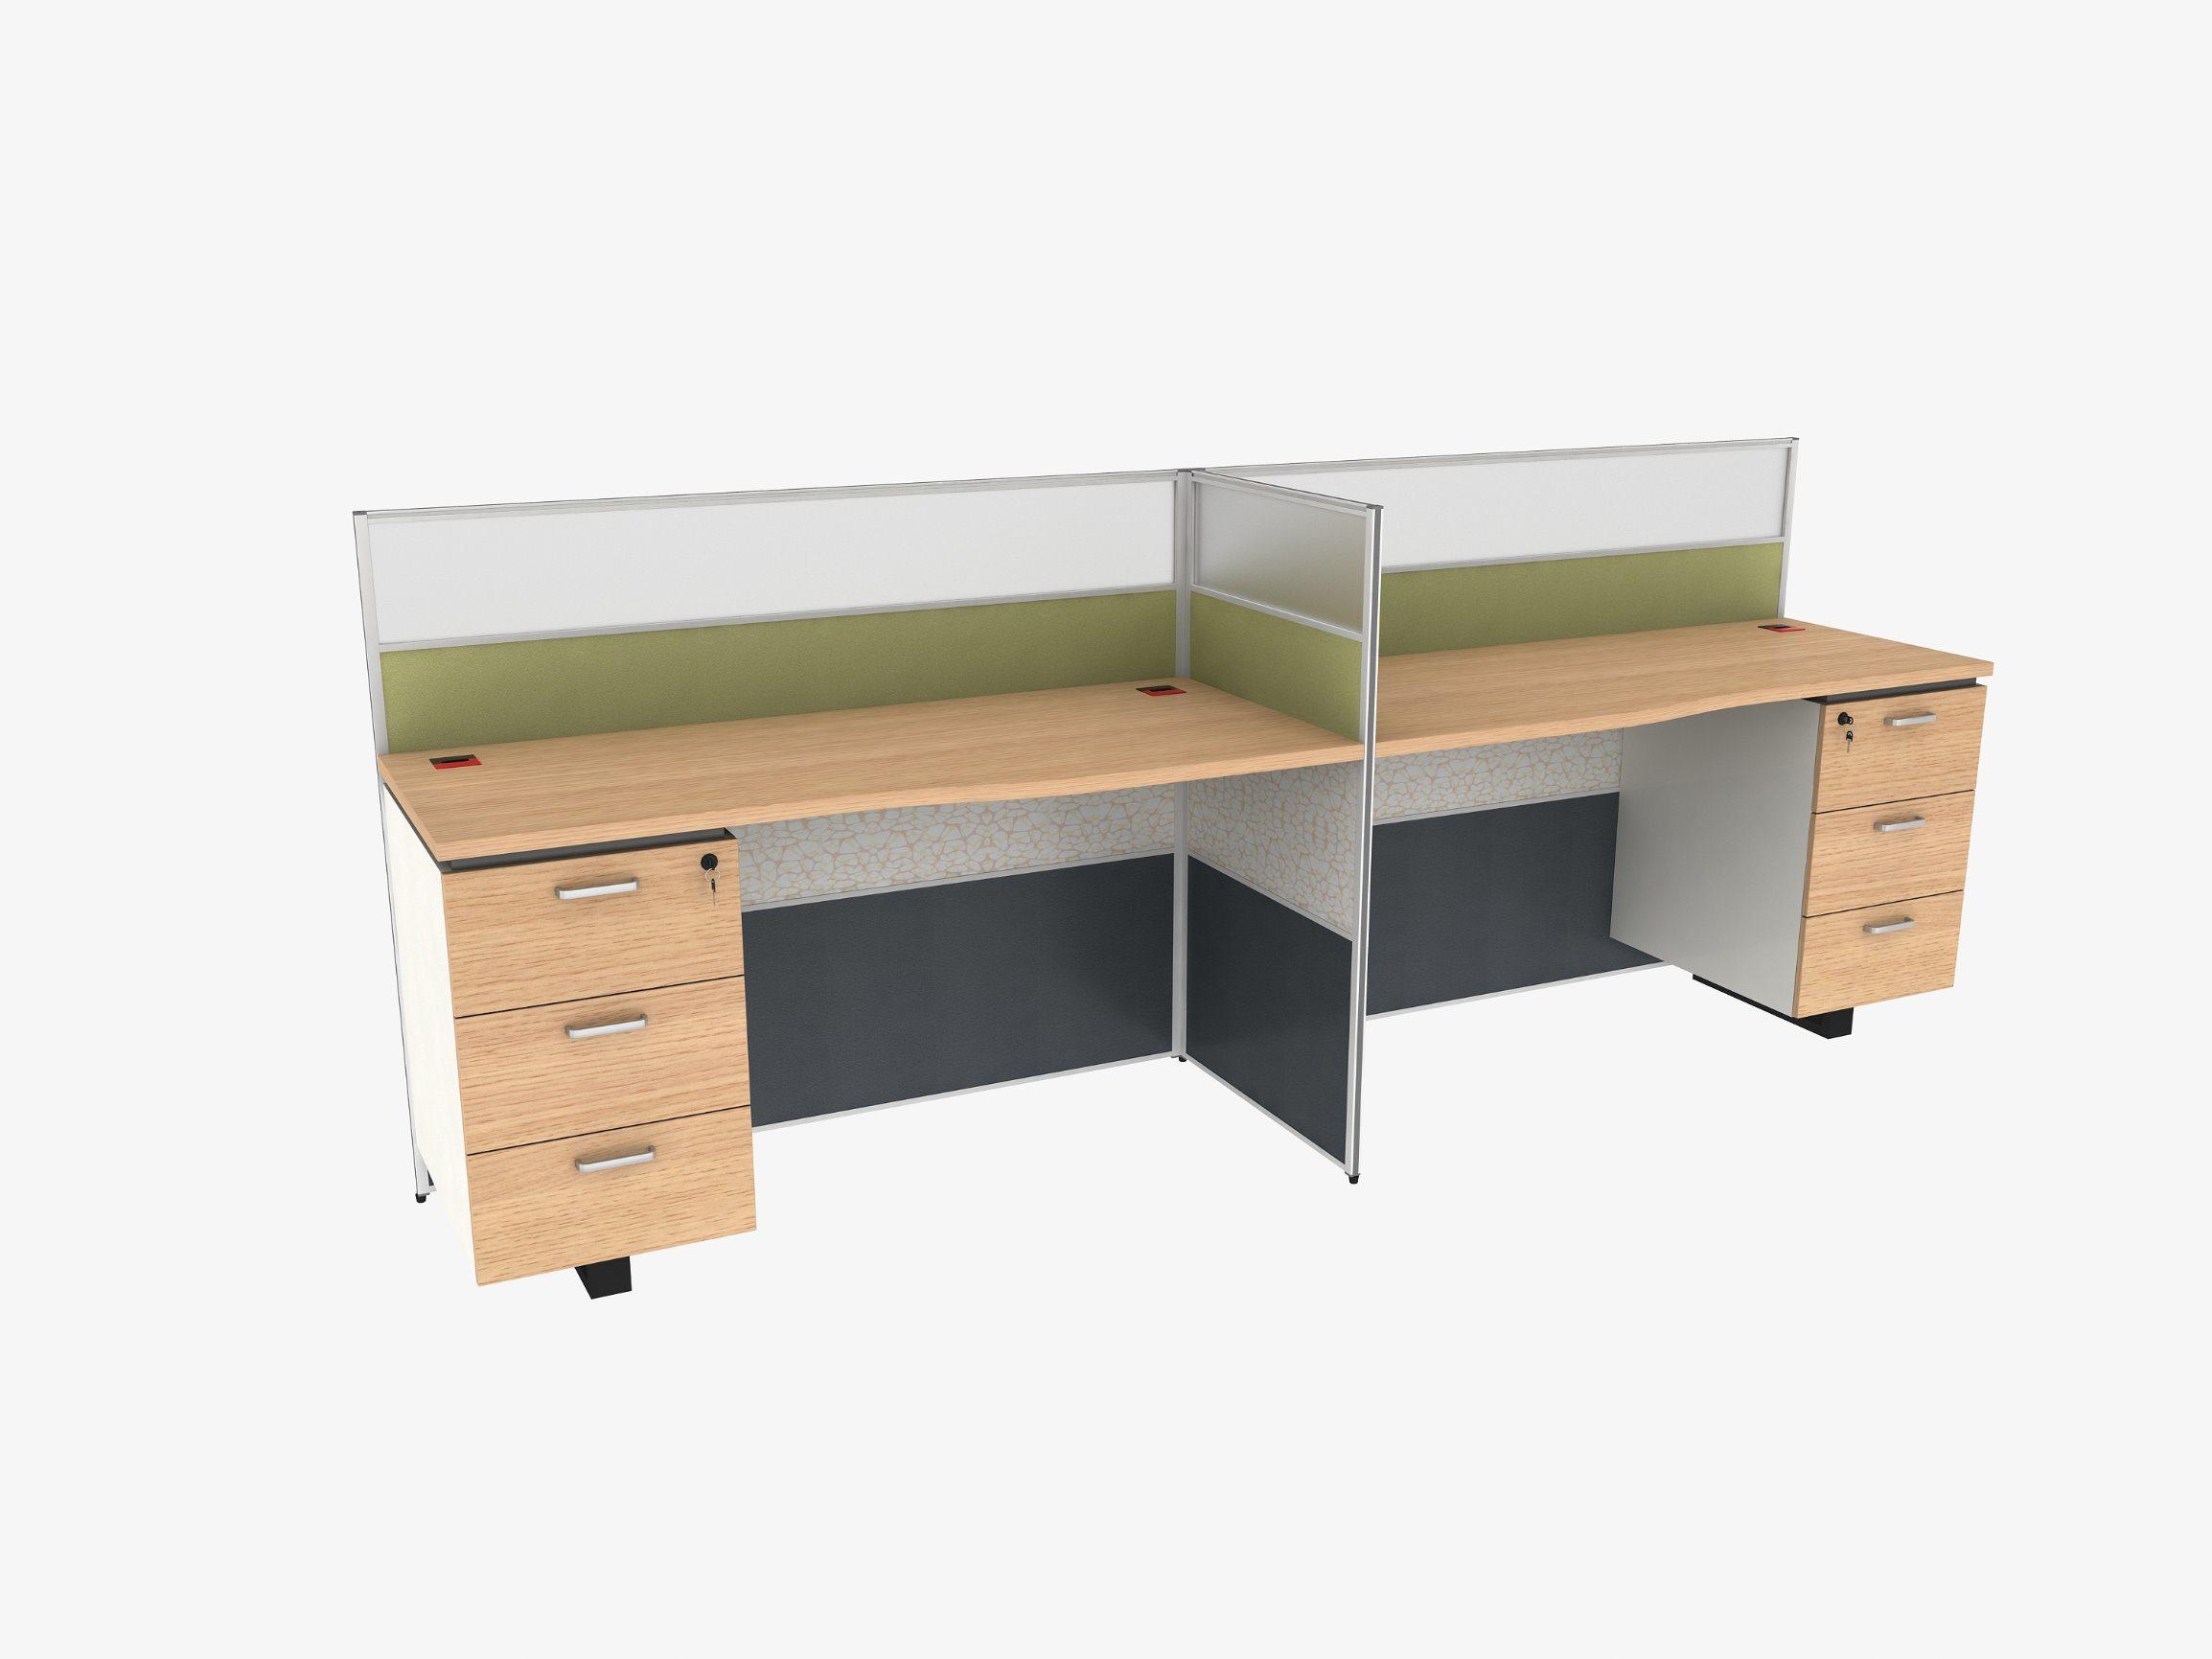 Hot Item Wooden Staff Table Office Desk 2 Person Furniture Workstation